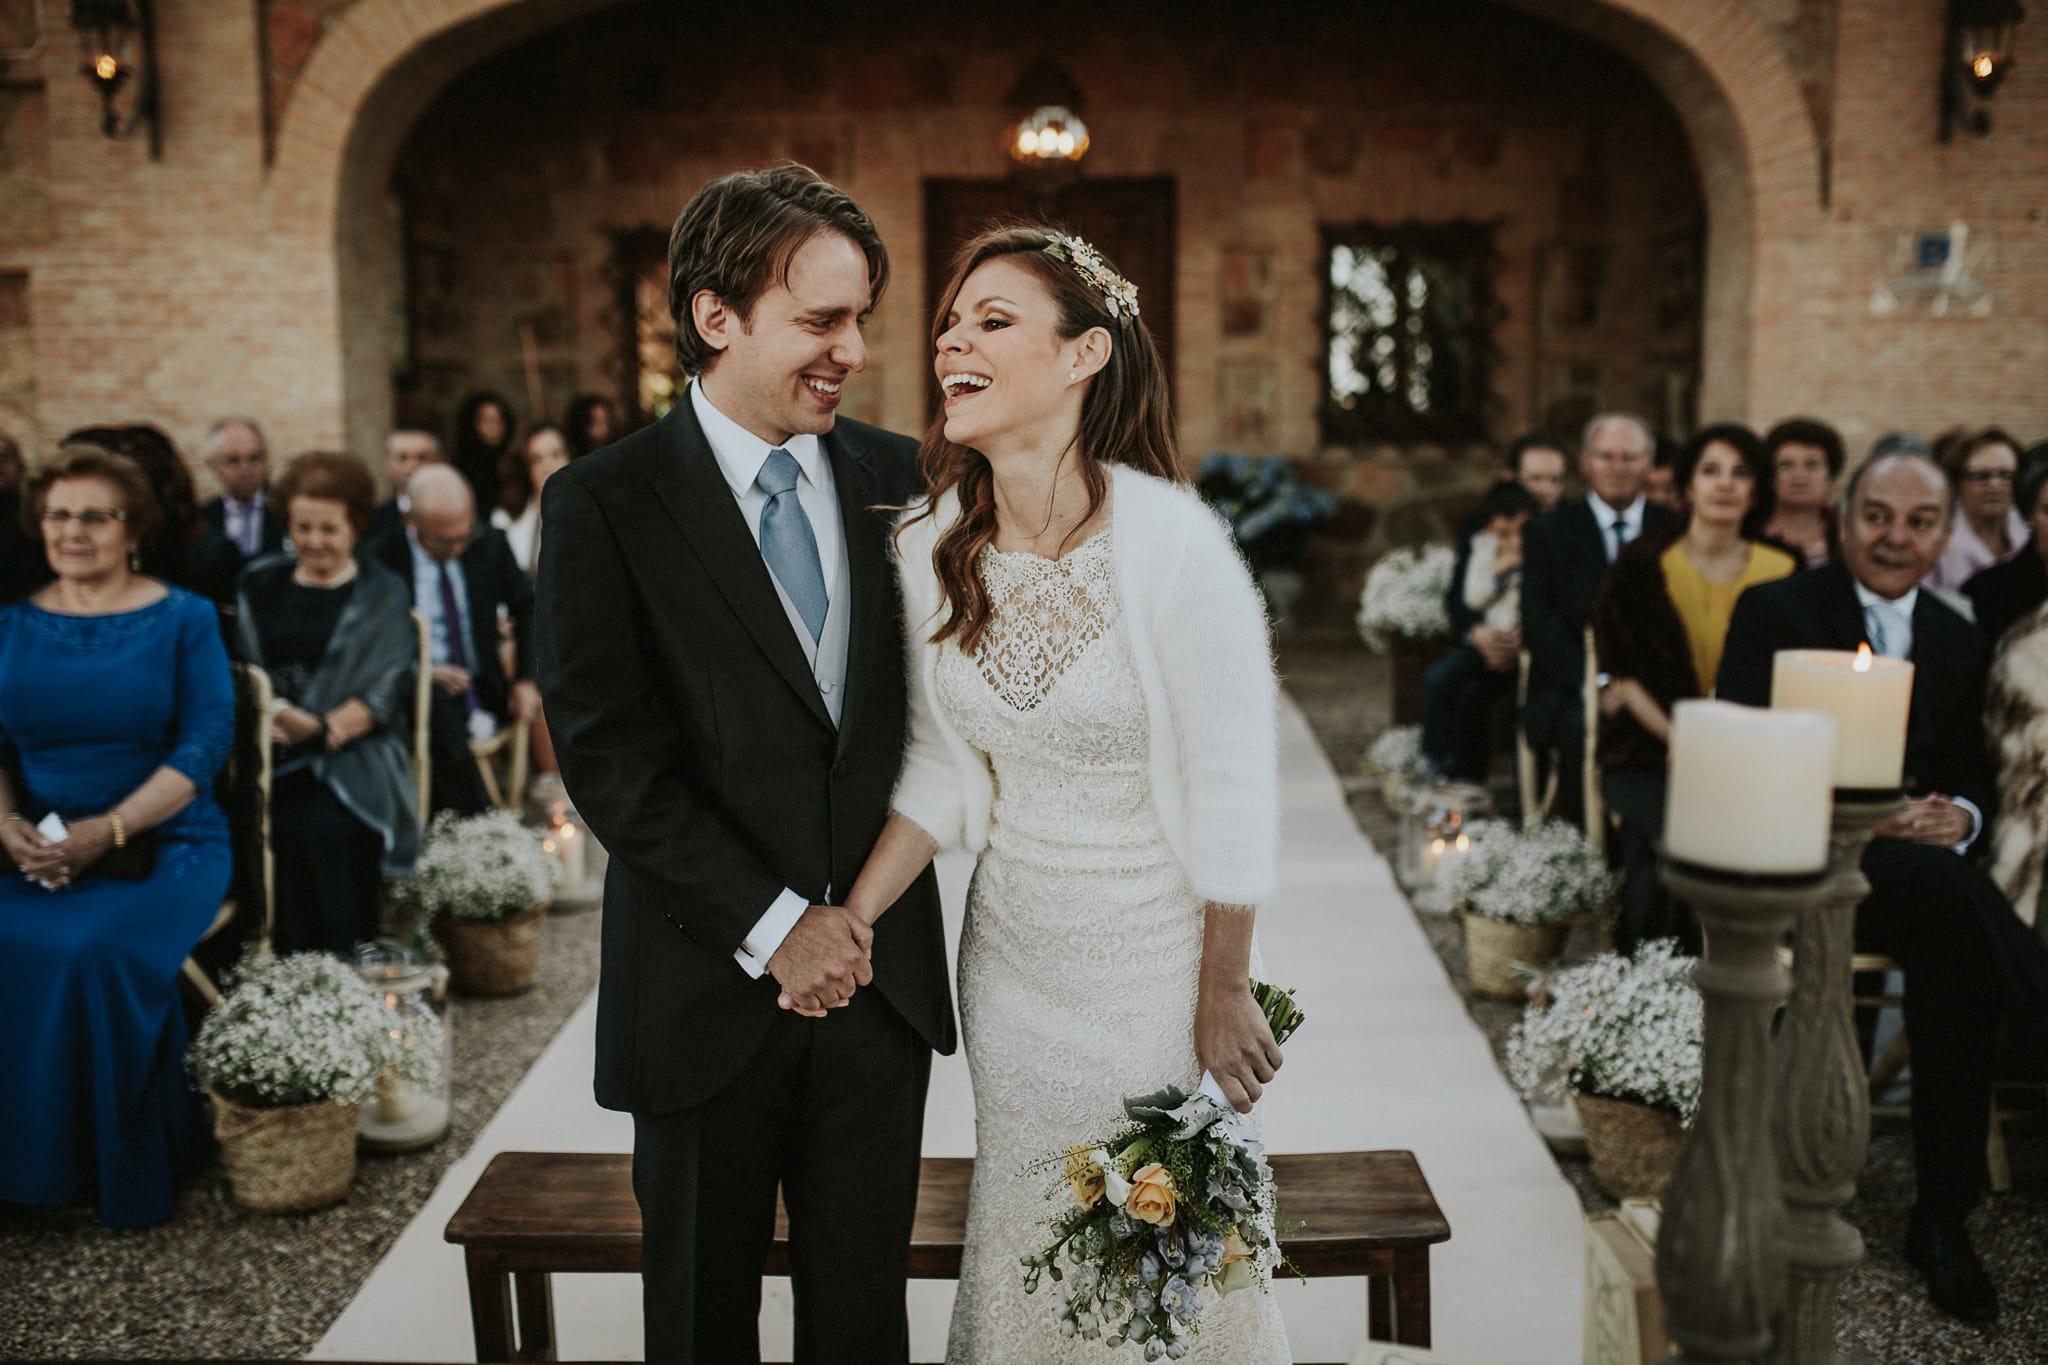 Fotografo-bodas-Cigarral-de-las-Mercedes-79